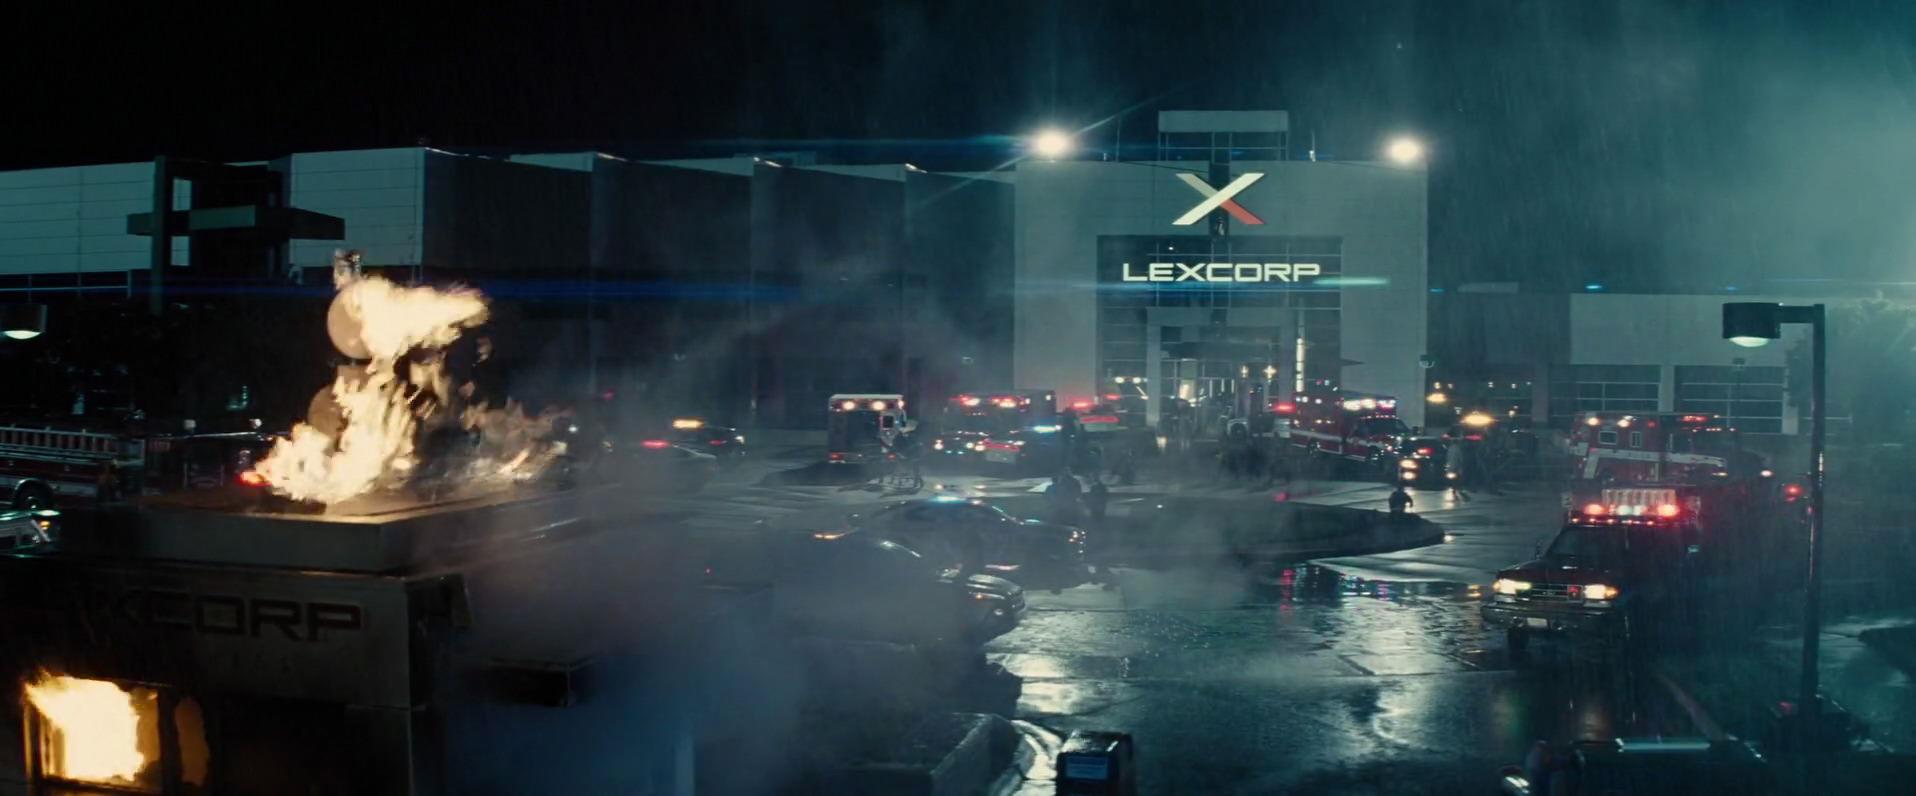 LexCorp Research Park